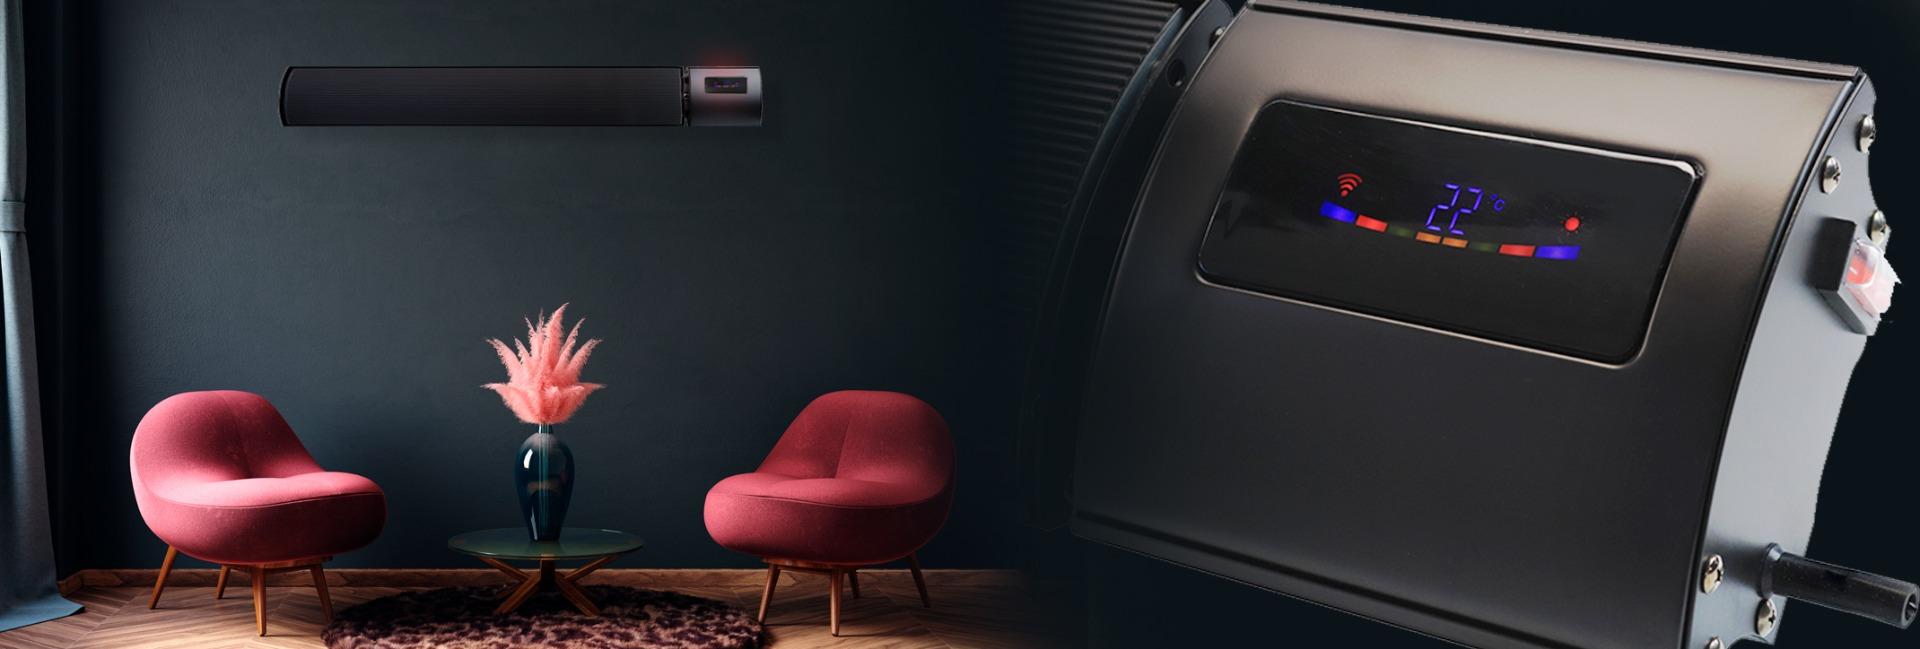 Surya Infrared Bar Heater Remote Control